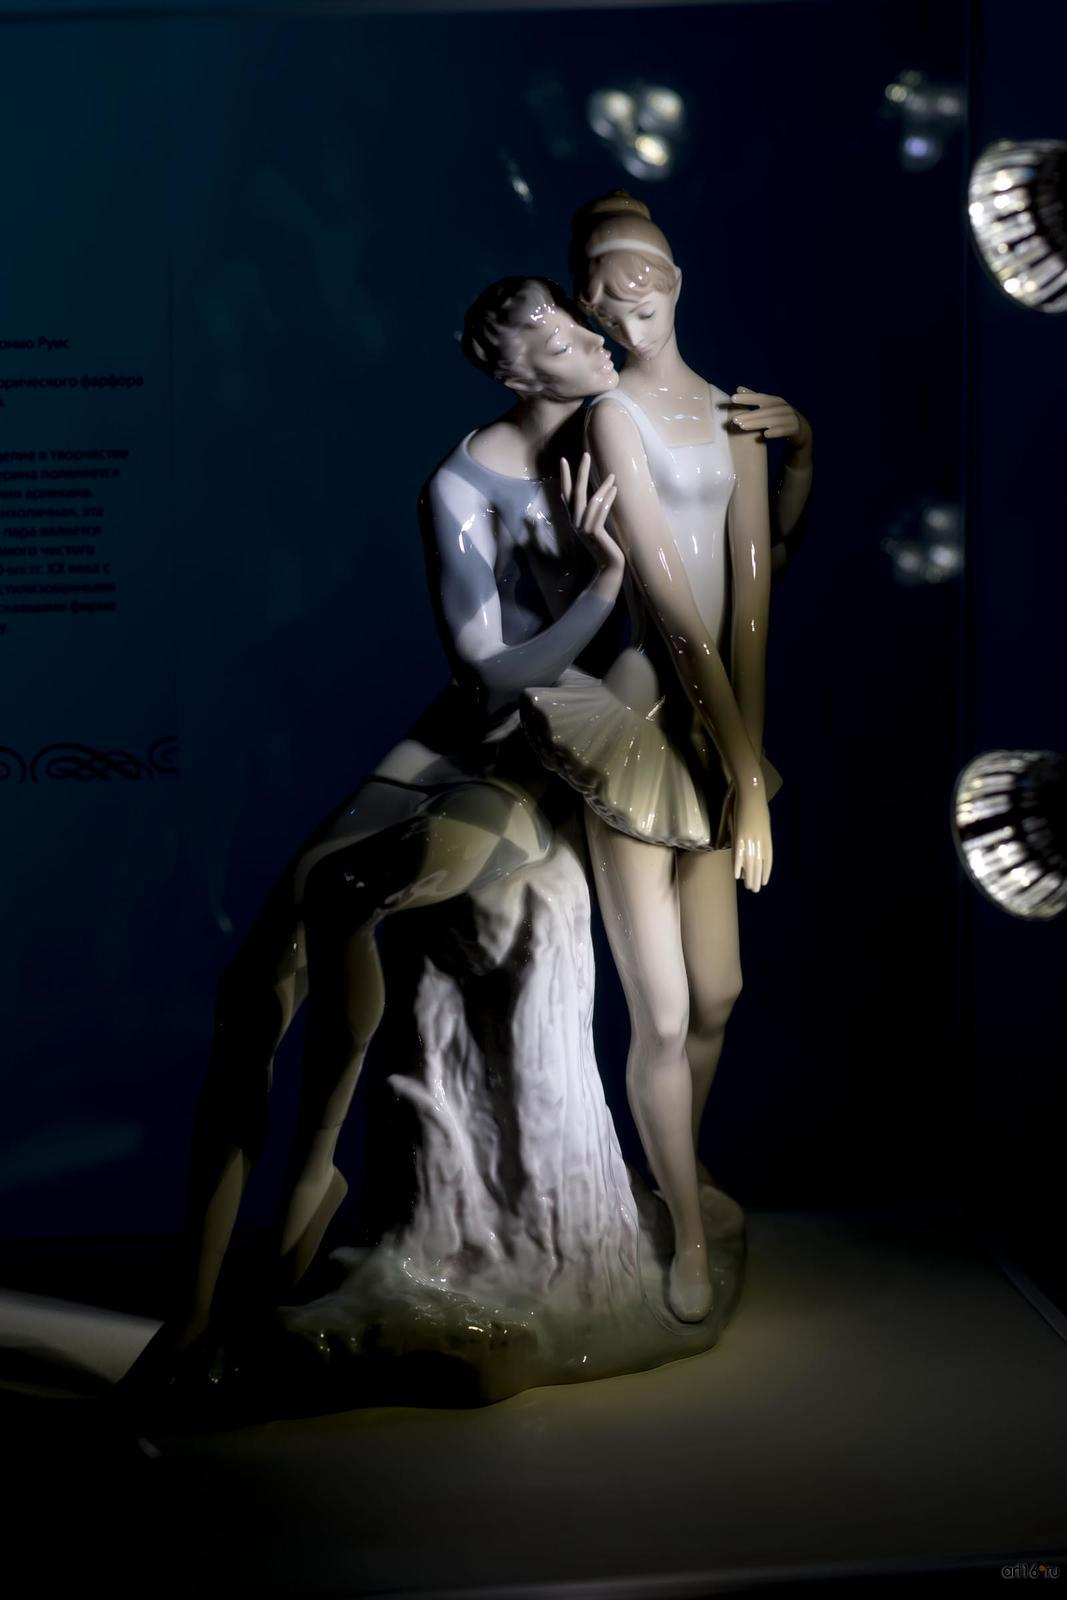 Фото №865679. Идиллия. Скульптор Антонио Руис. 1970-1991 гг.